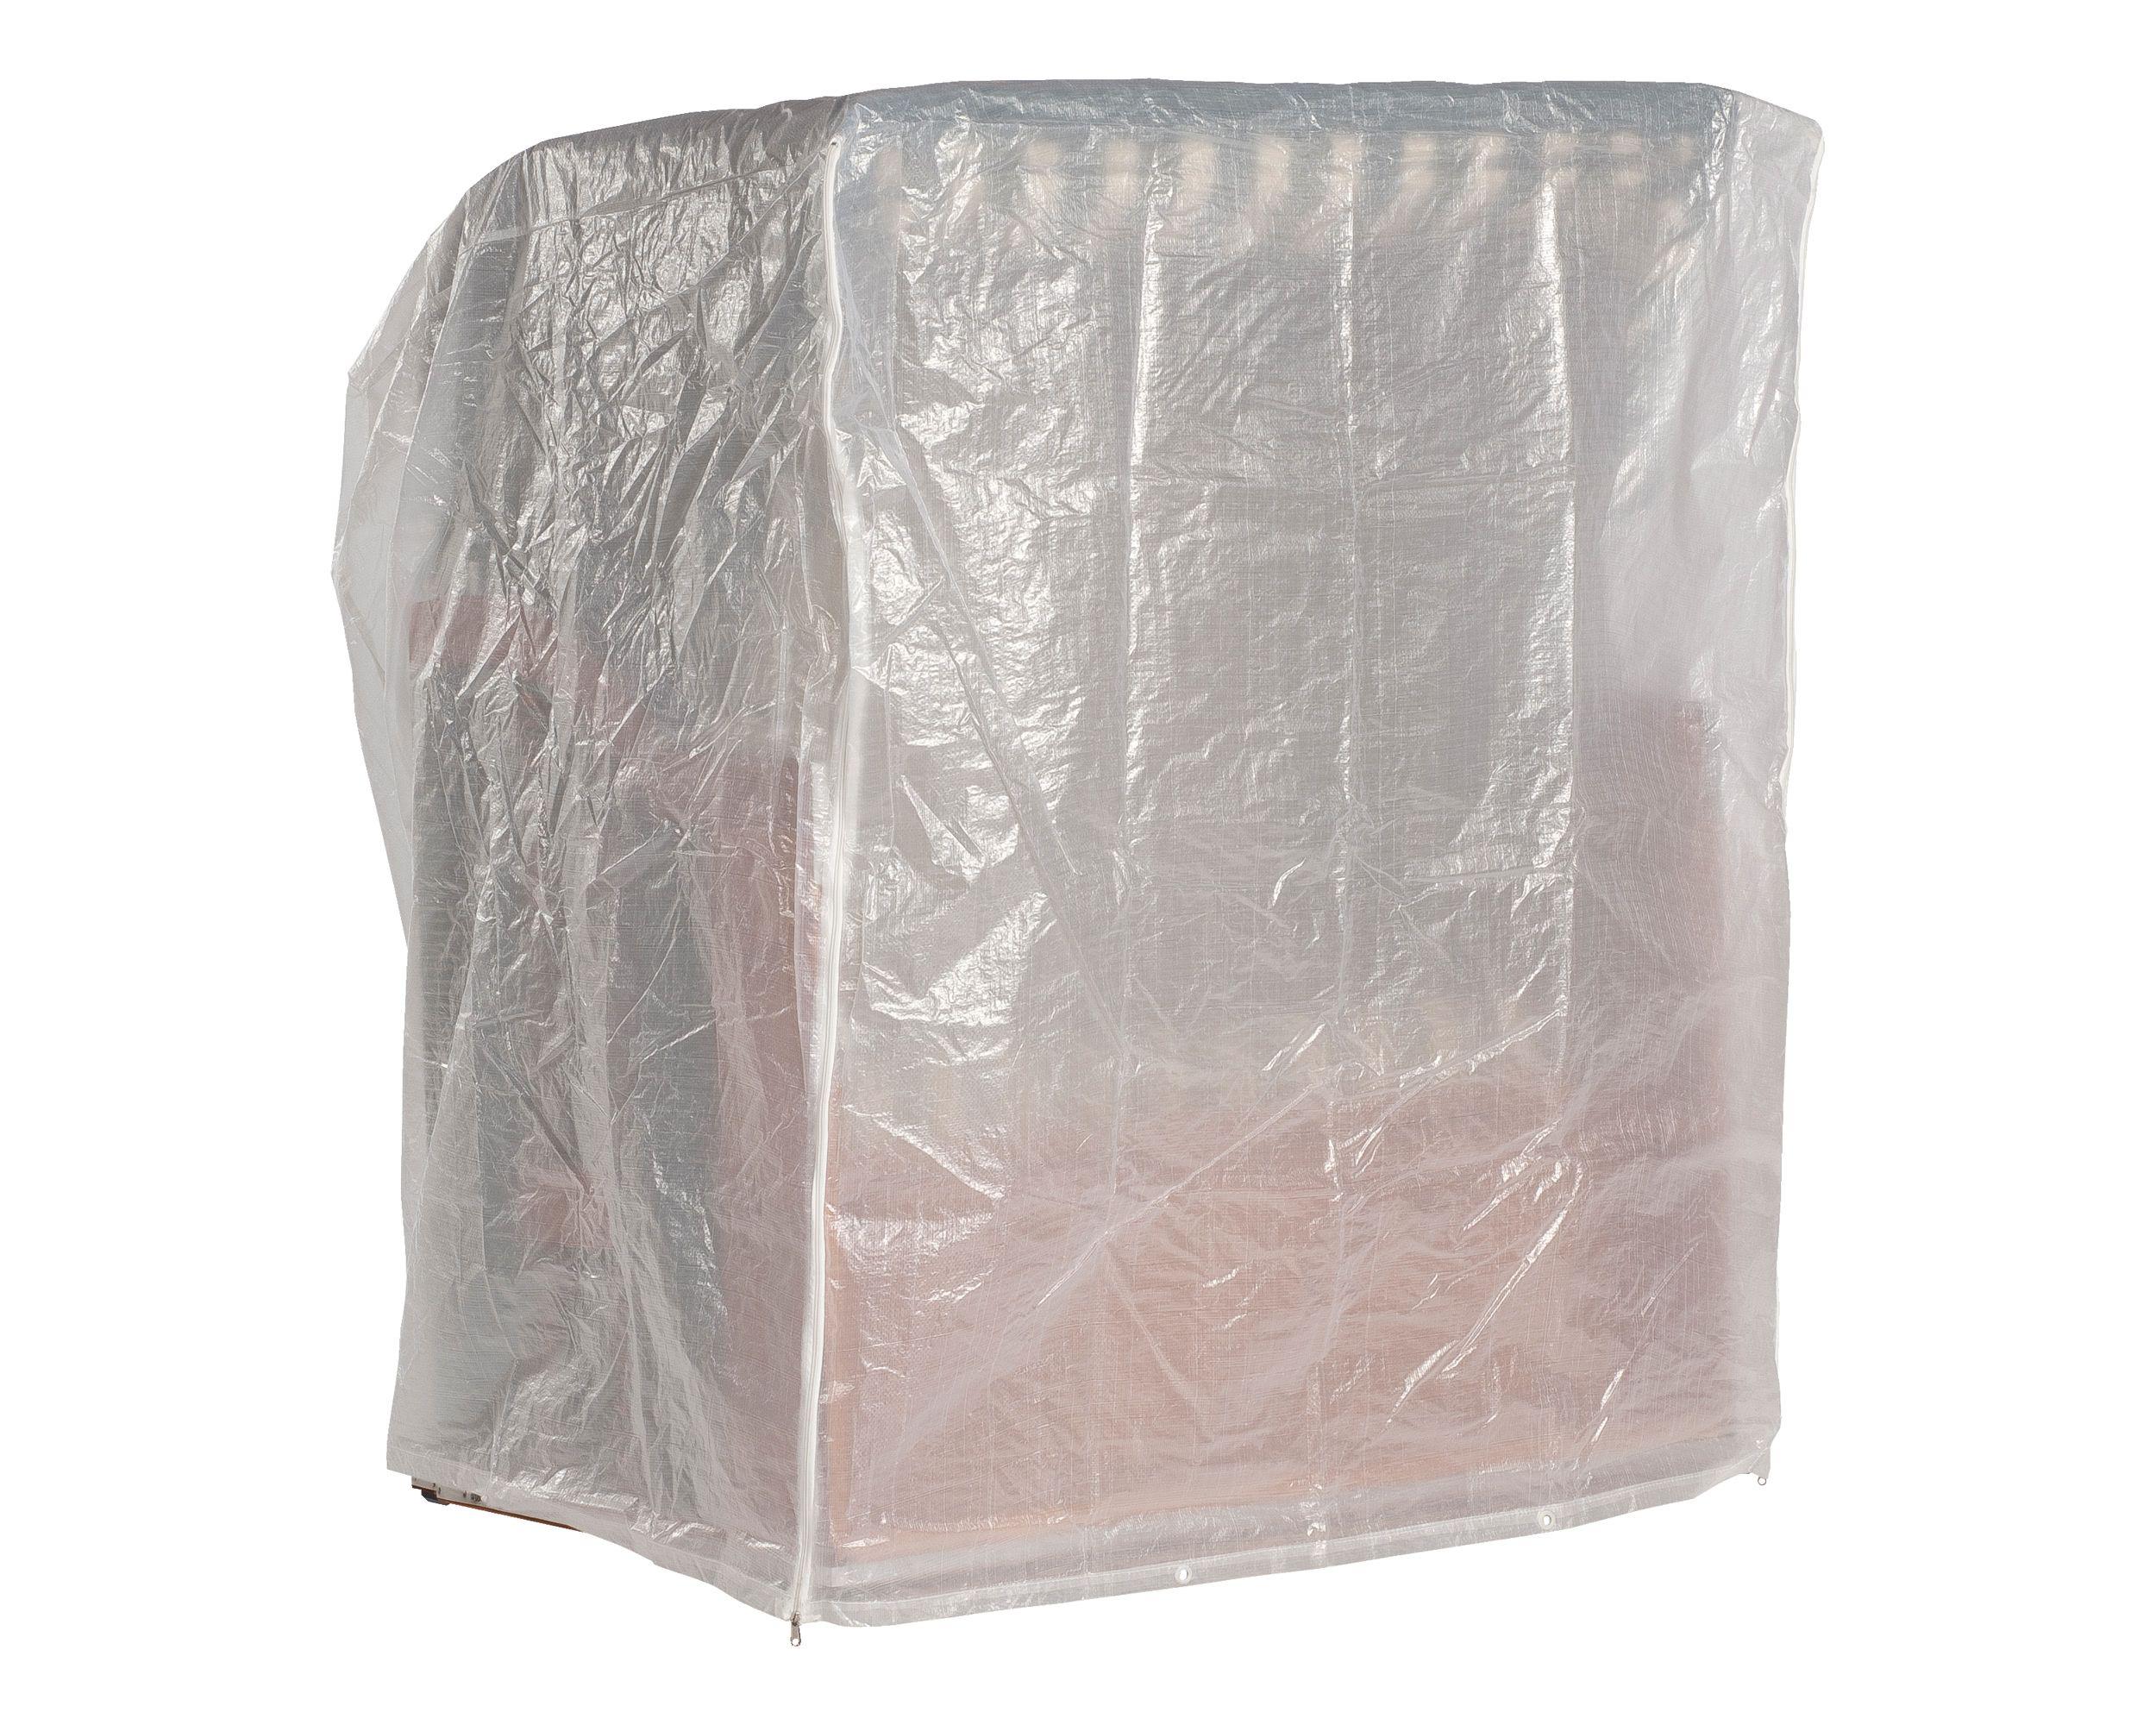 Schutzhülle für Strandkorb 2-Sitzer XL, transparent, 150x110x156 cm